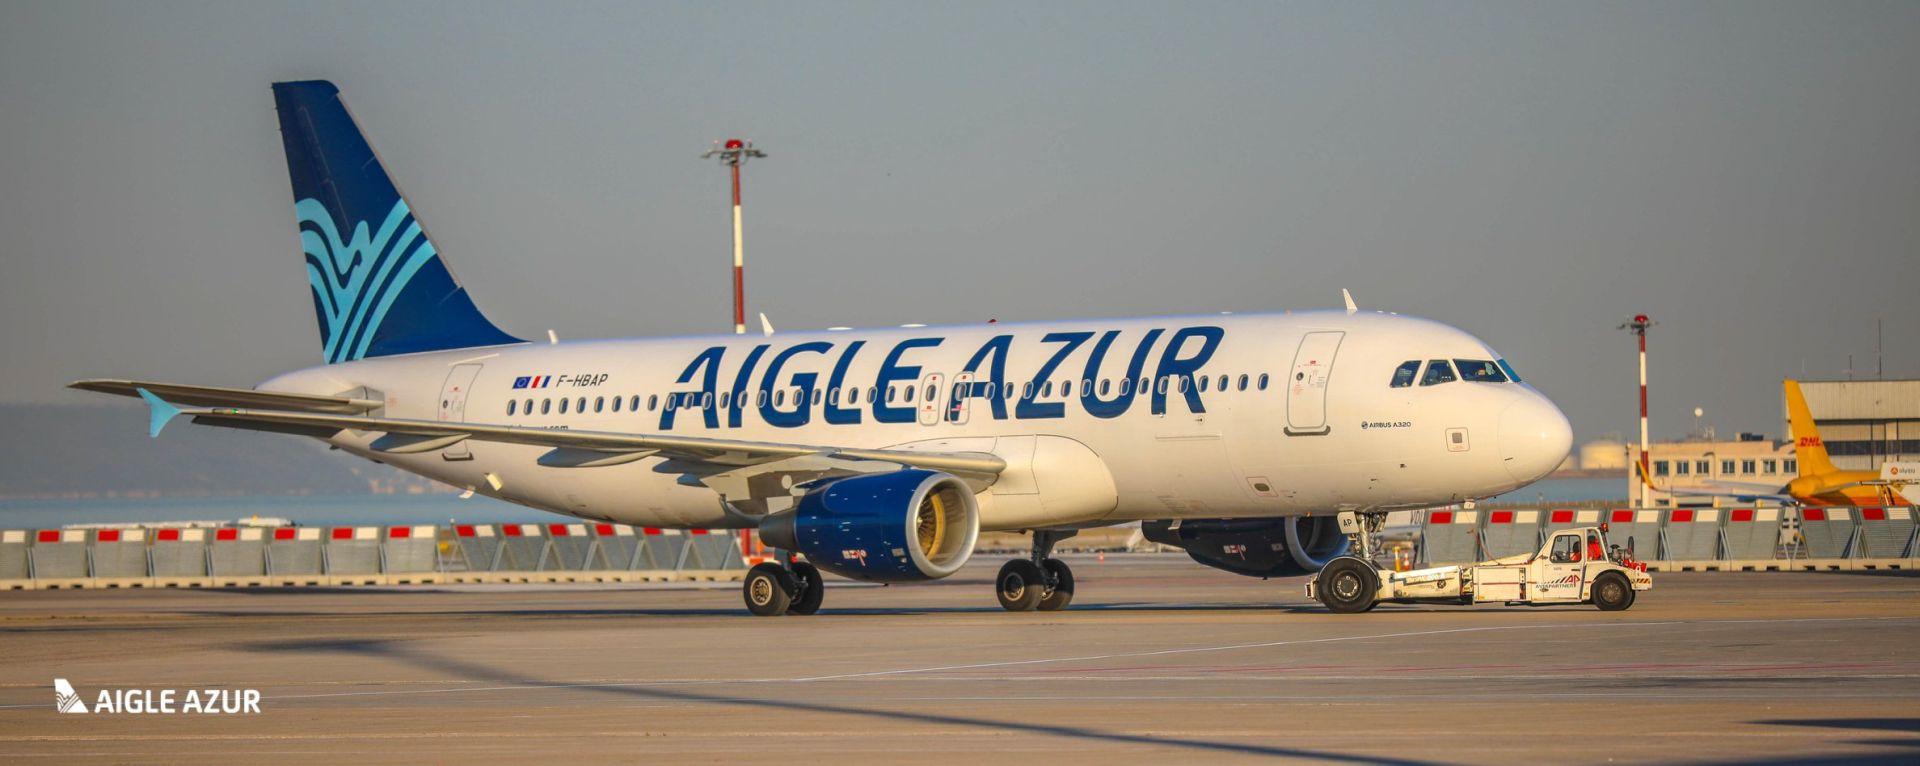 Airbus A320 společnosti Aigle Azur. Foto: Aigle Azur